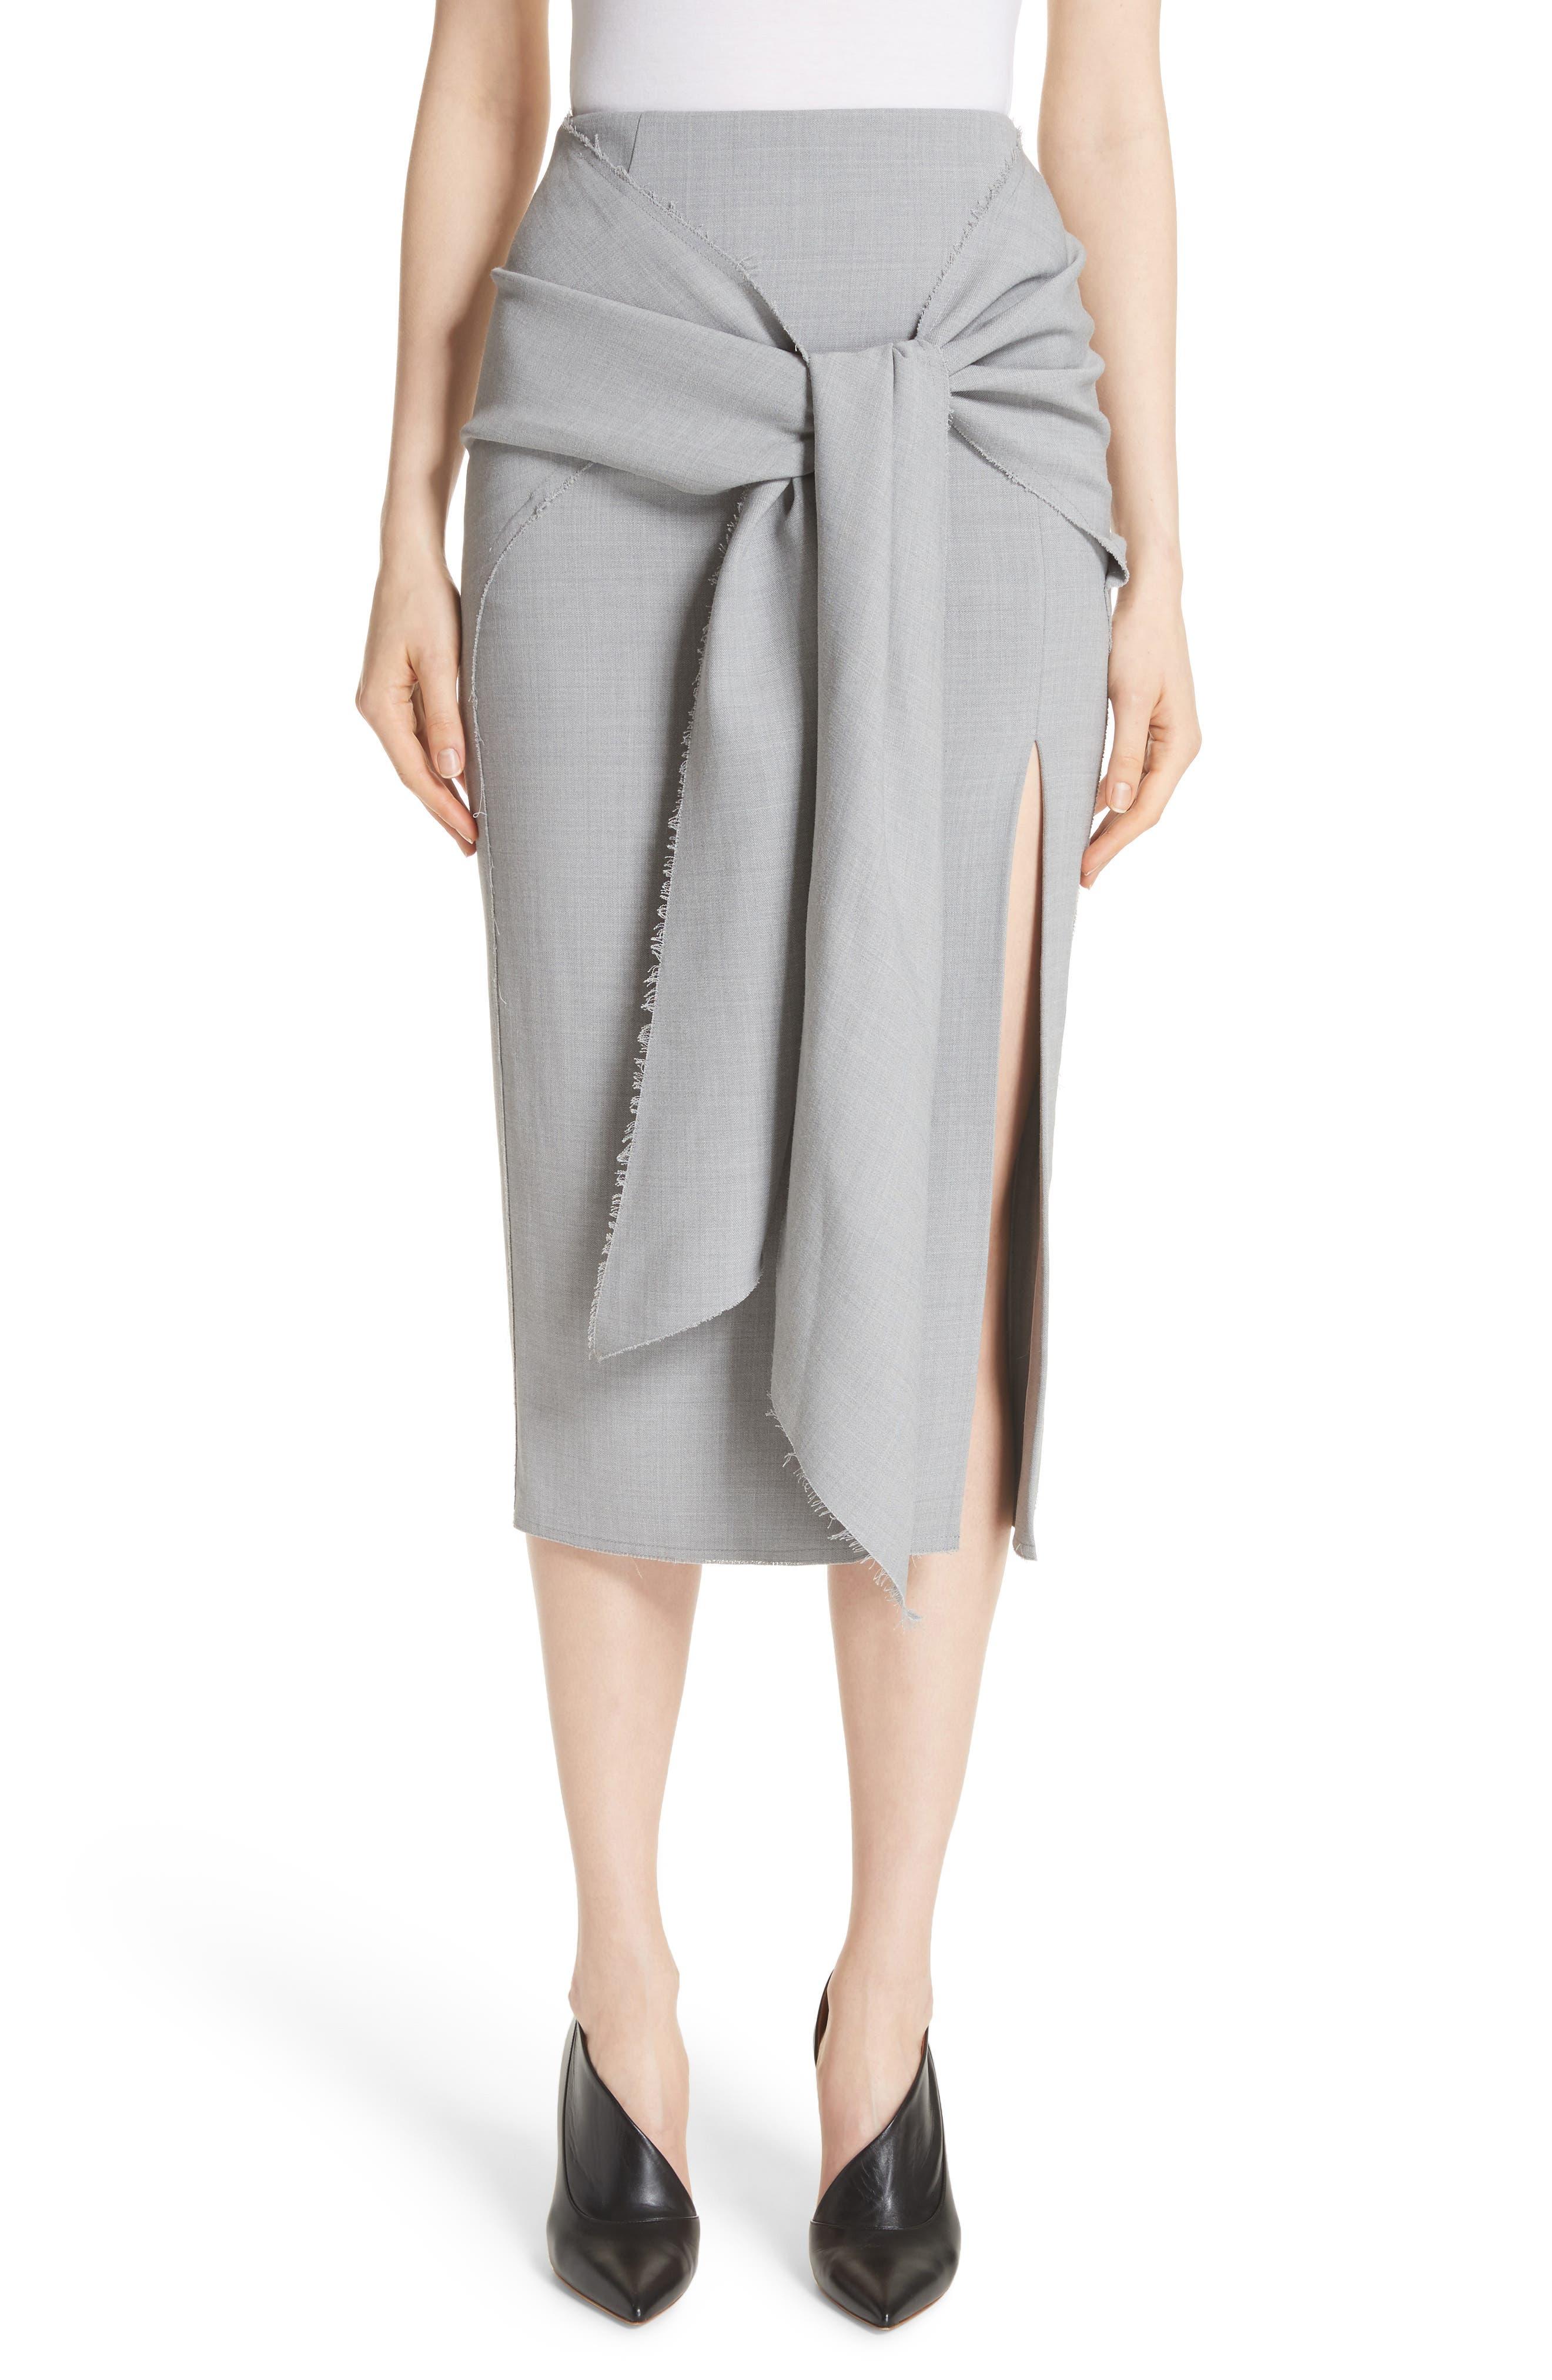 Raw Hem Tie Front Skirt,                         Main,                         color, Light Grey Melange